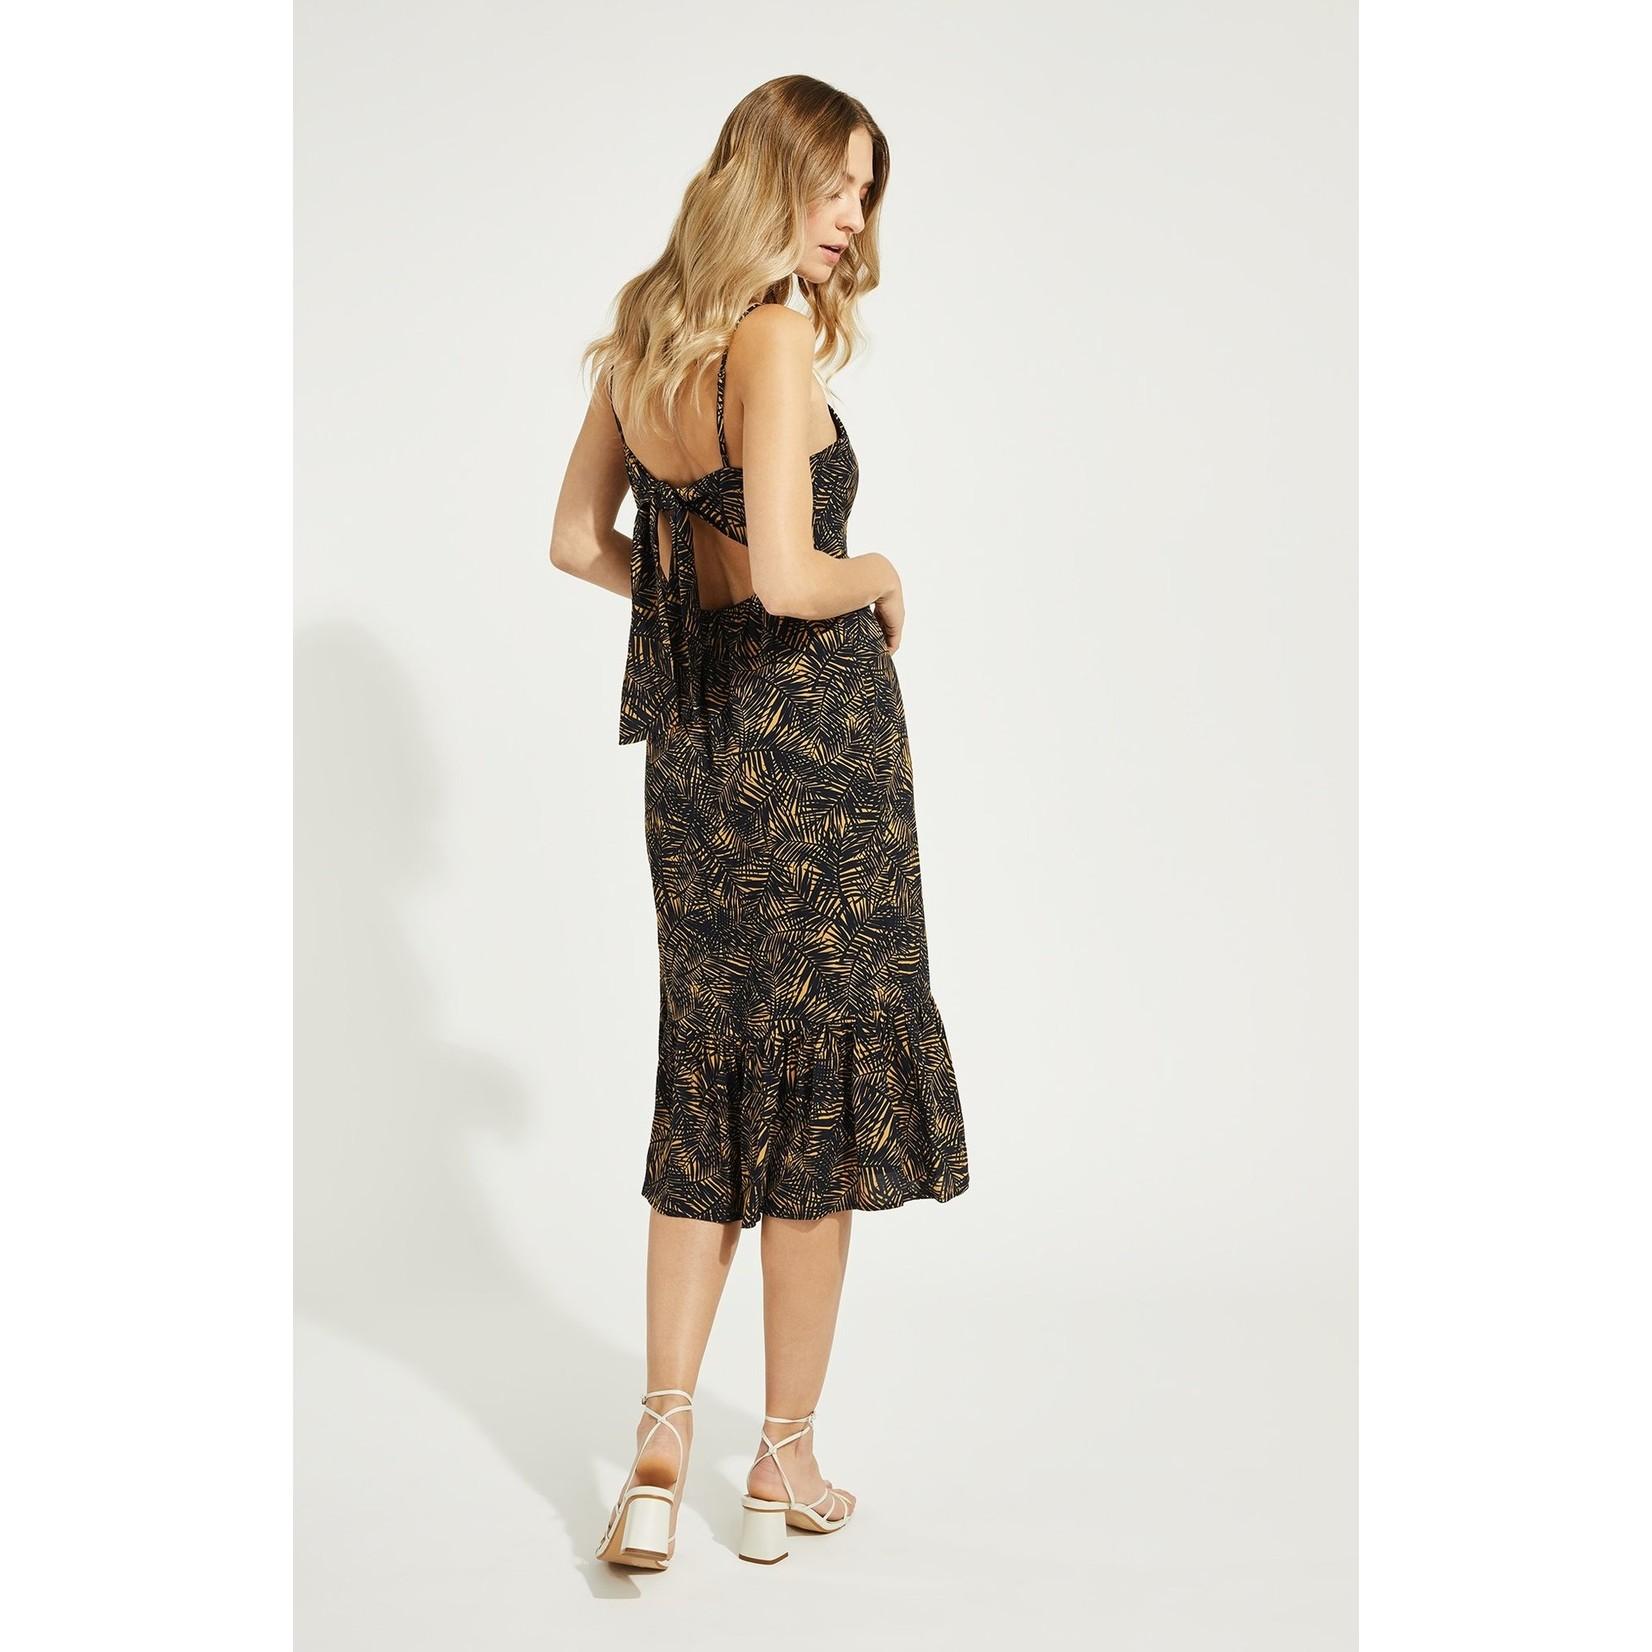 GENTLE FAWN AMBROSIA DRESS